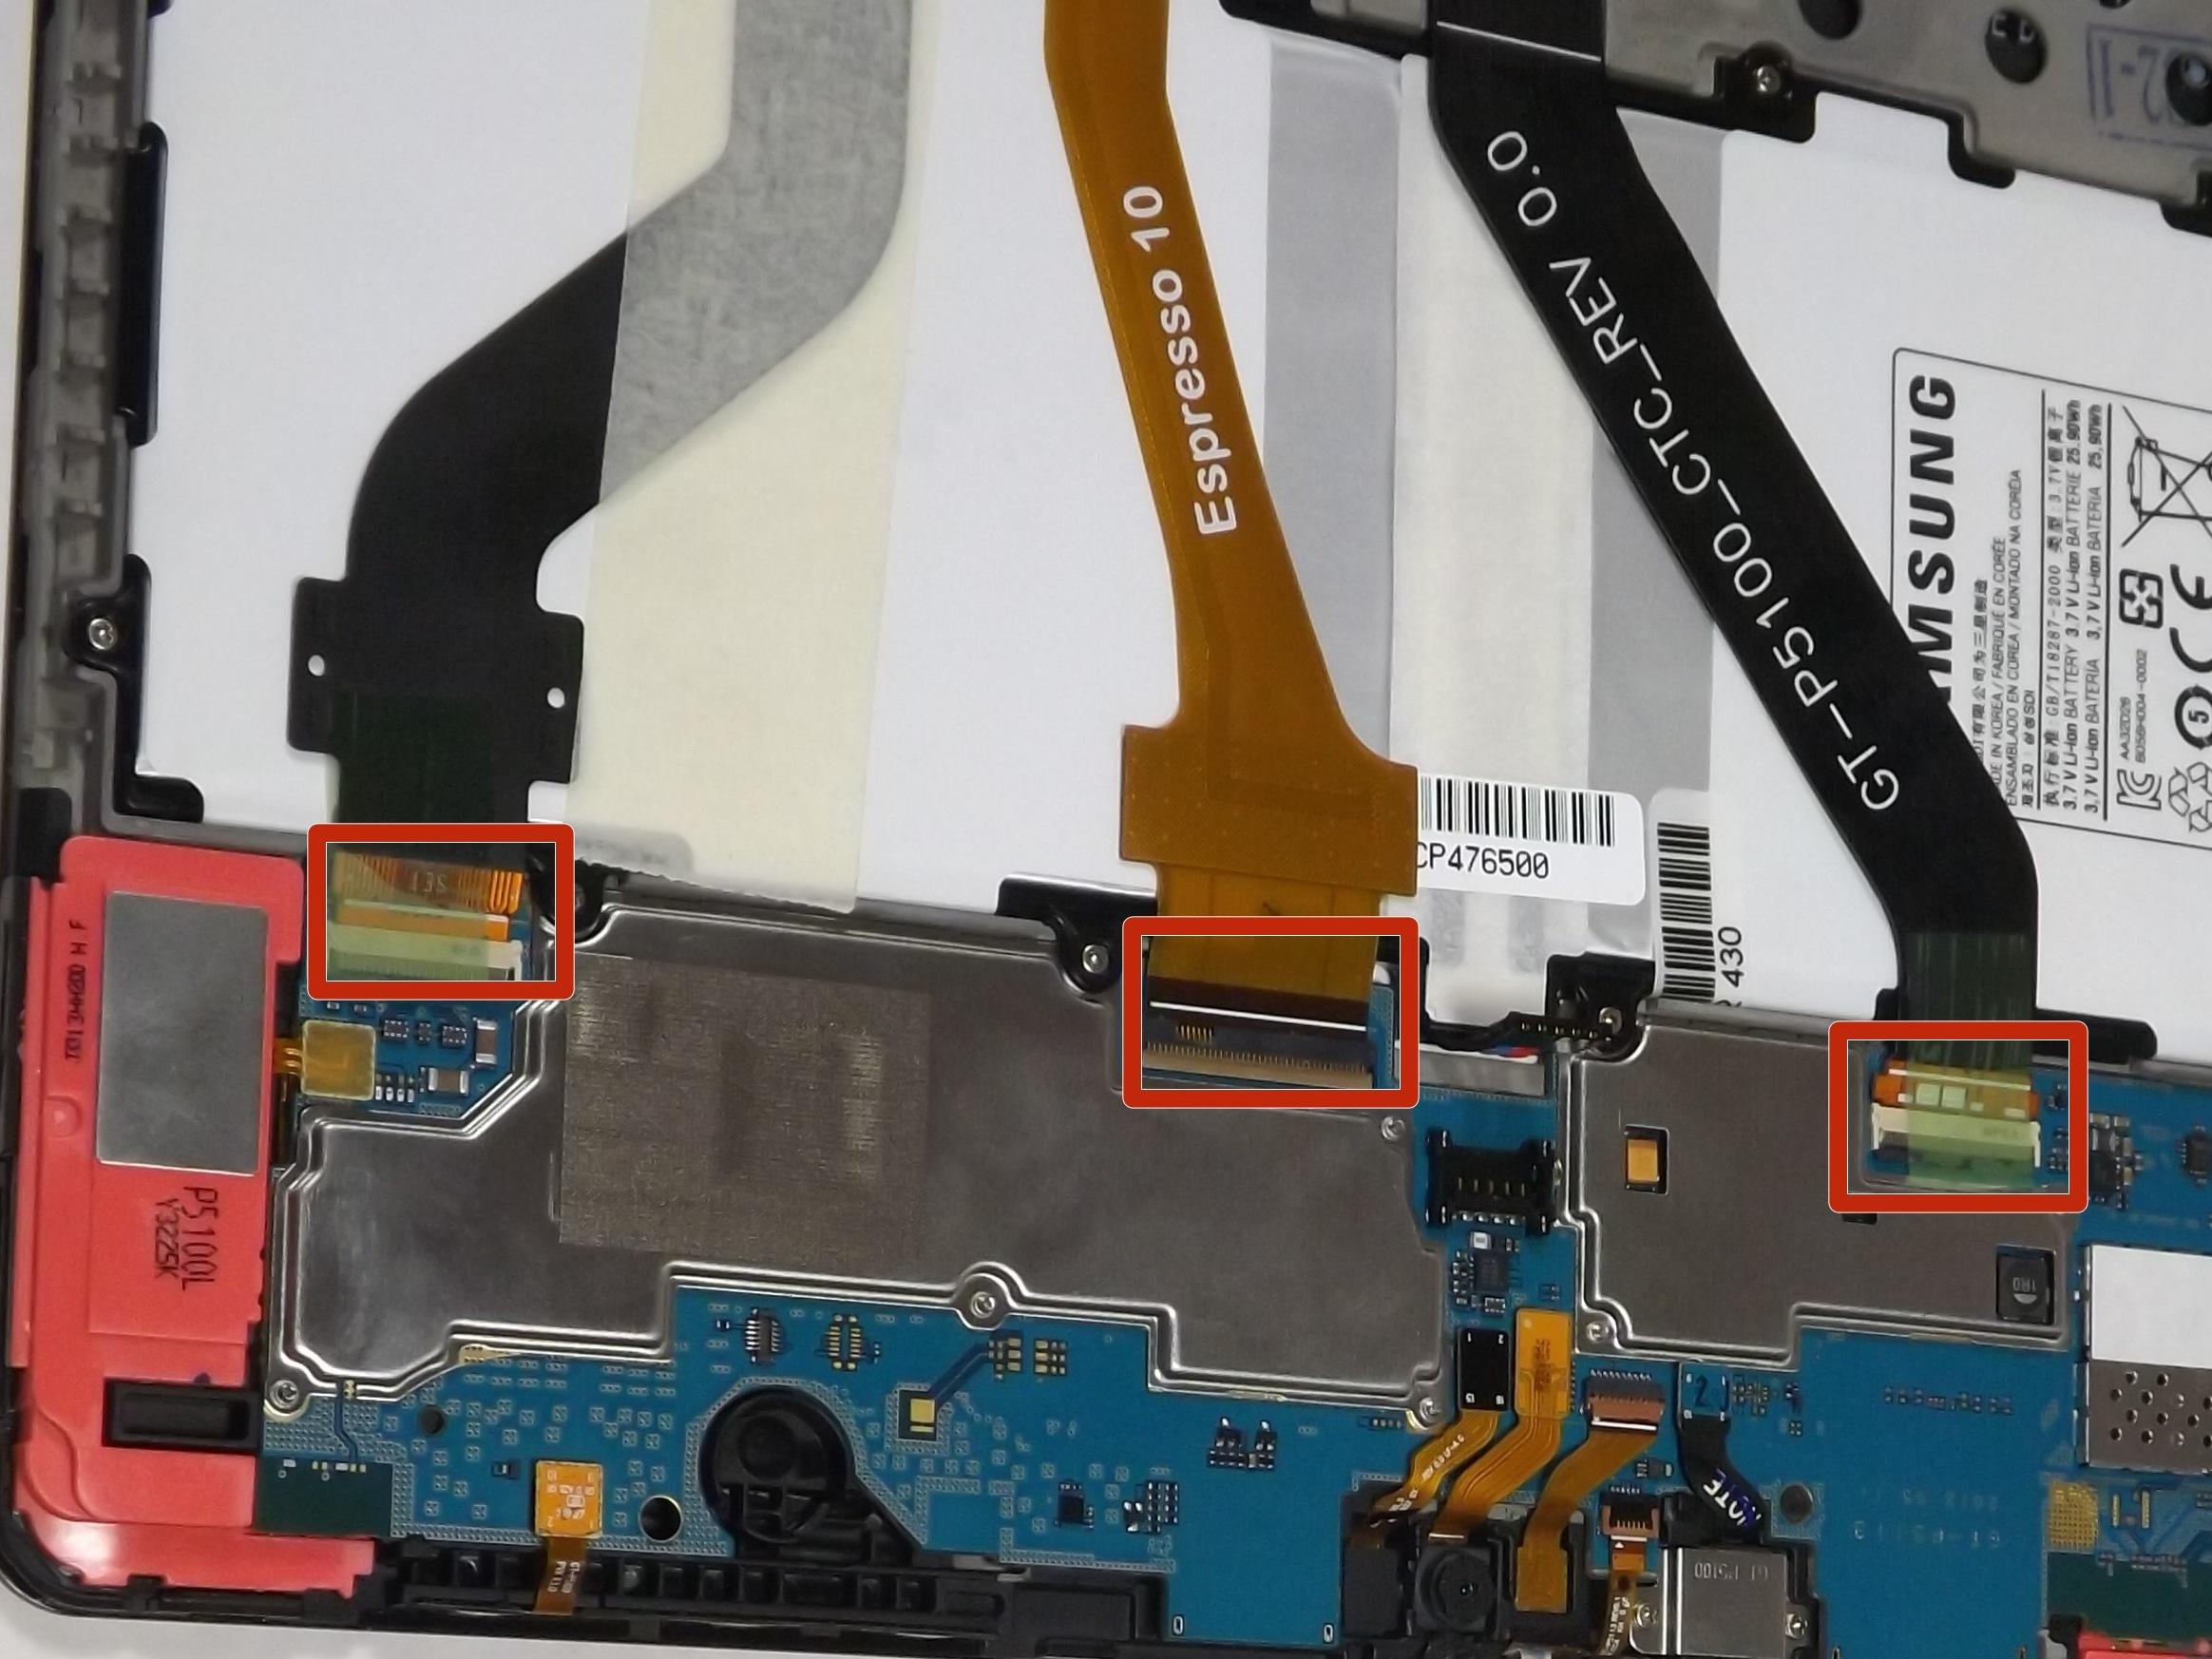 Samsung Galaxy Tab 2 101 Repair Ifixit Sgh G810 Service Manual Battery